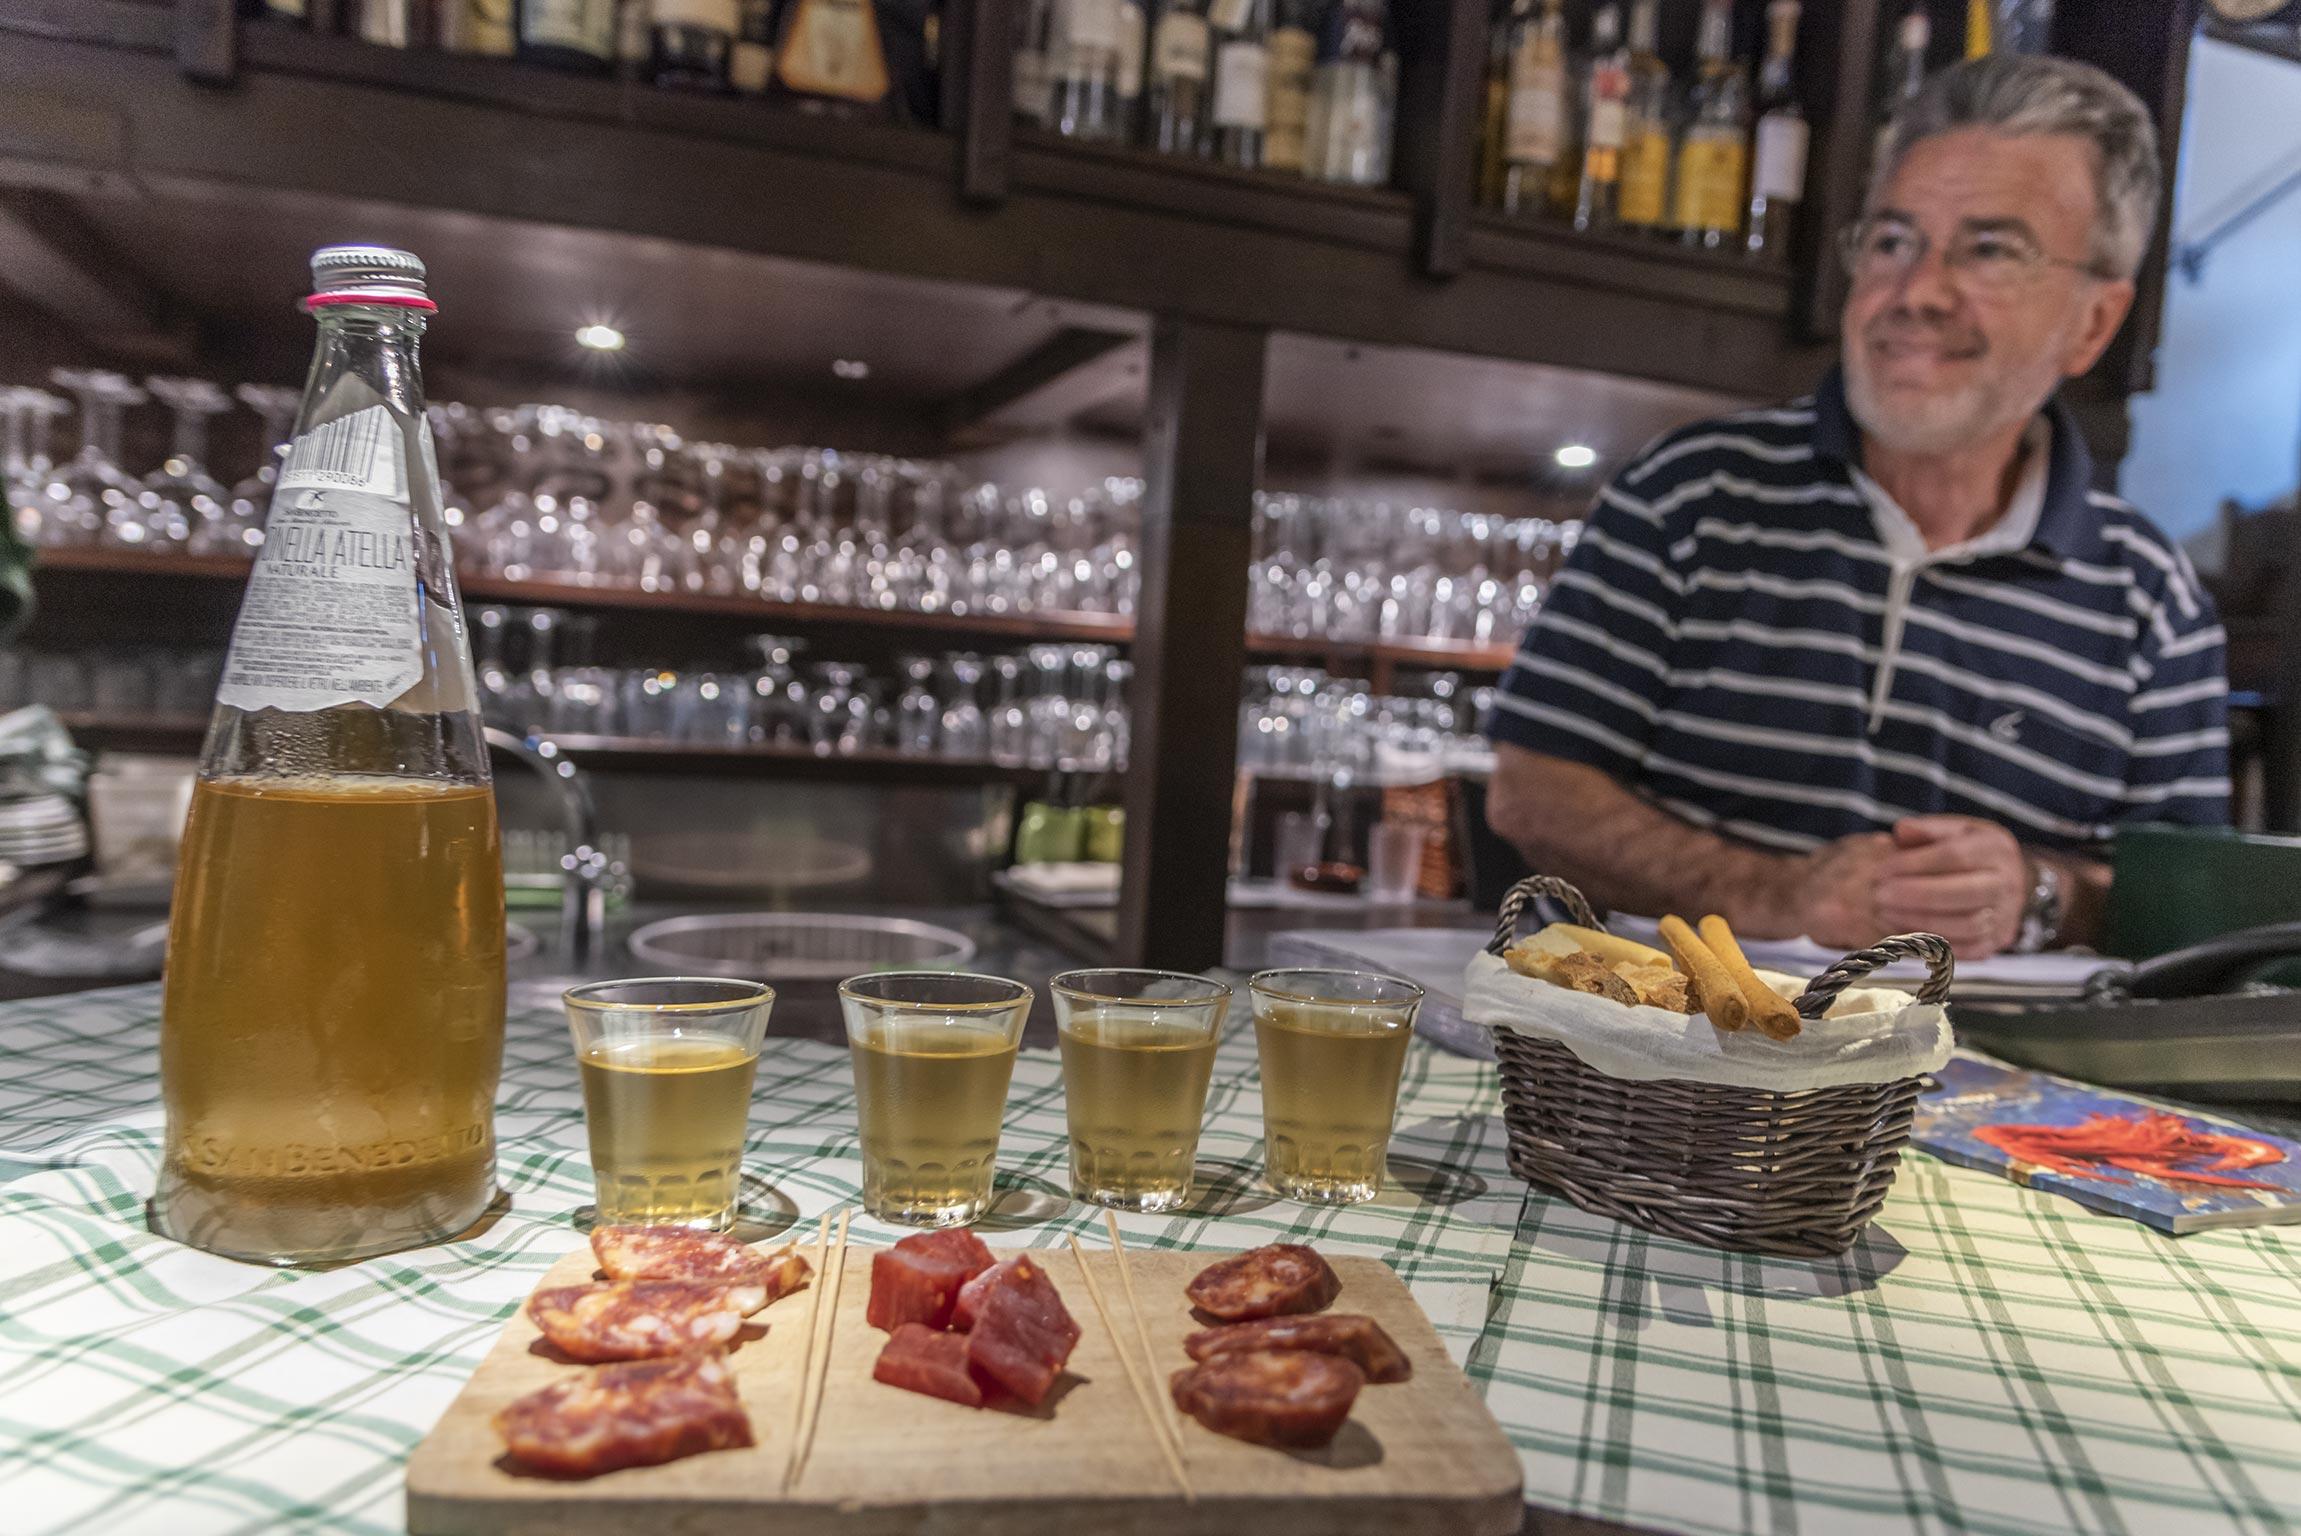 Esperienze a Terracina: aperitivo all'enoteca St. Patrick